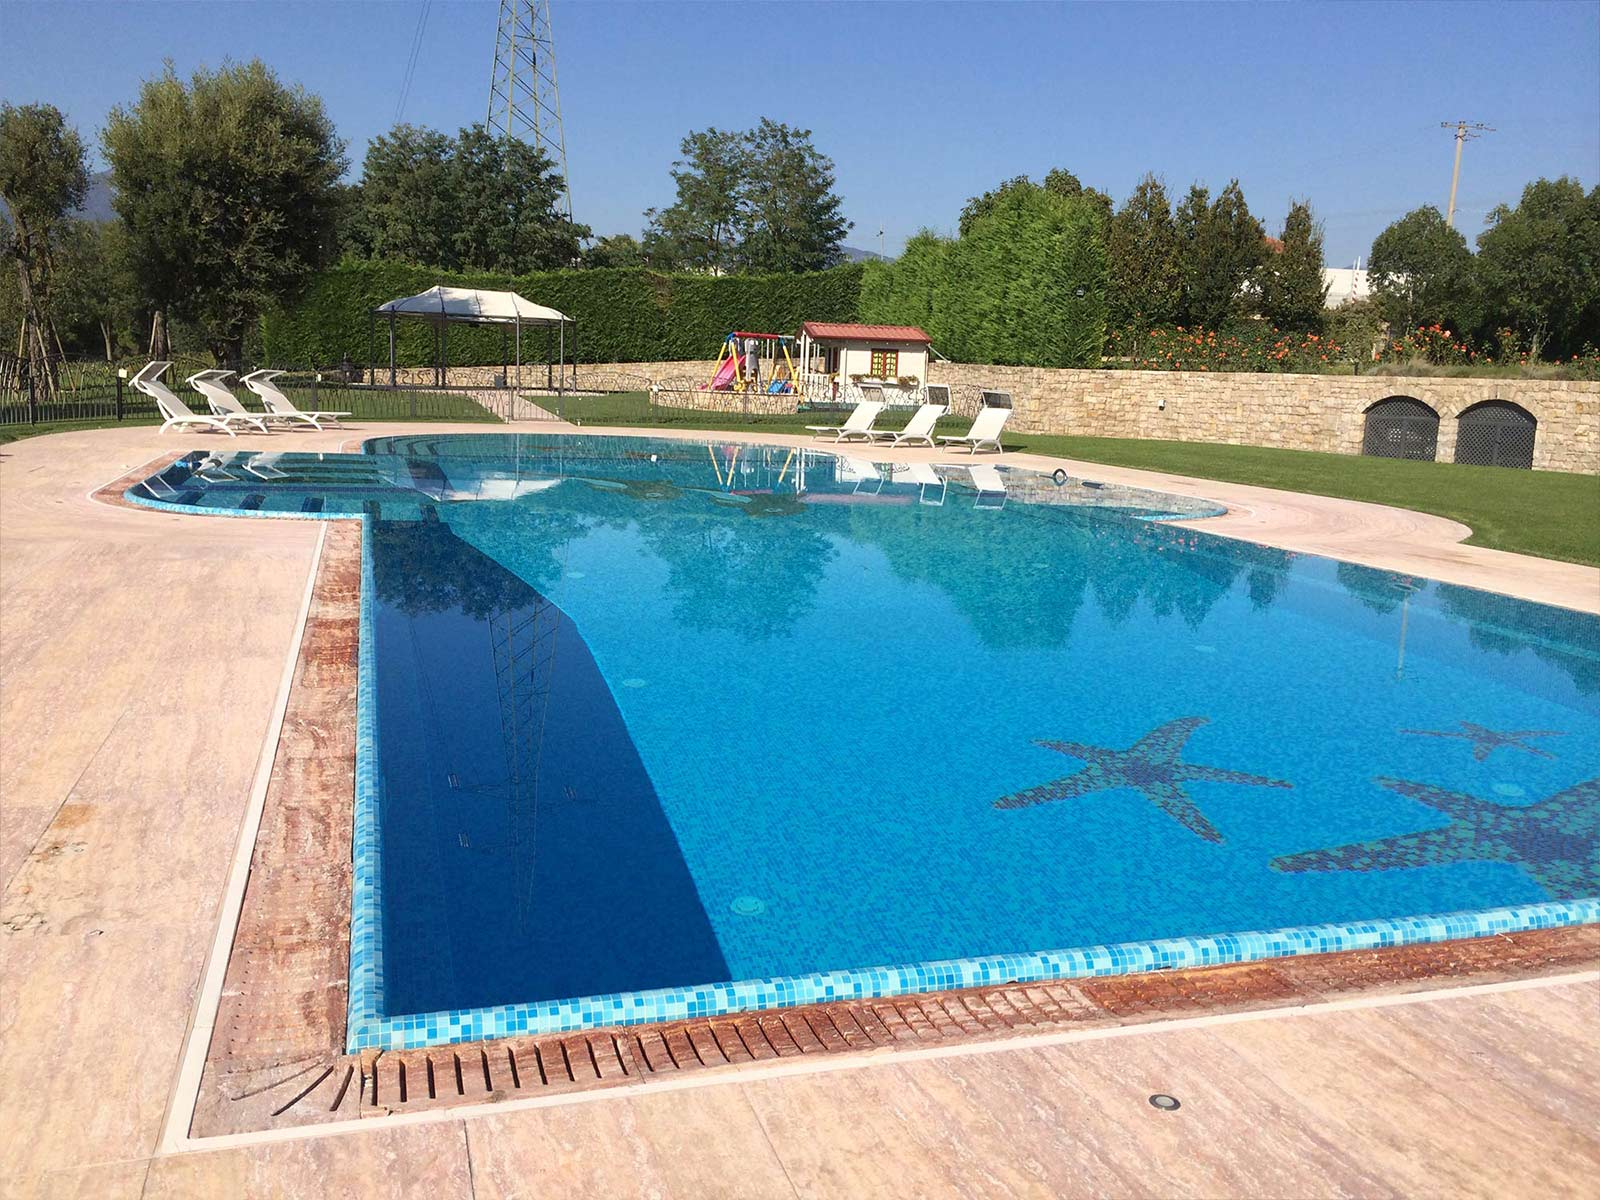 piscina a sfioro con rivestimento in mosaico